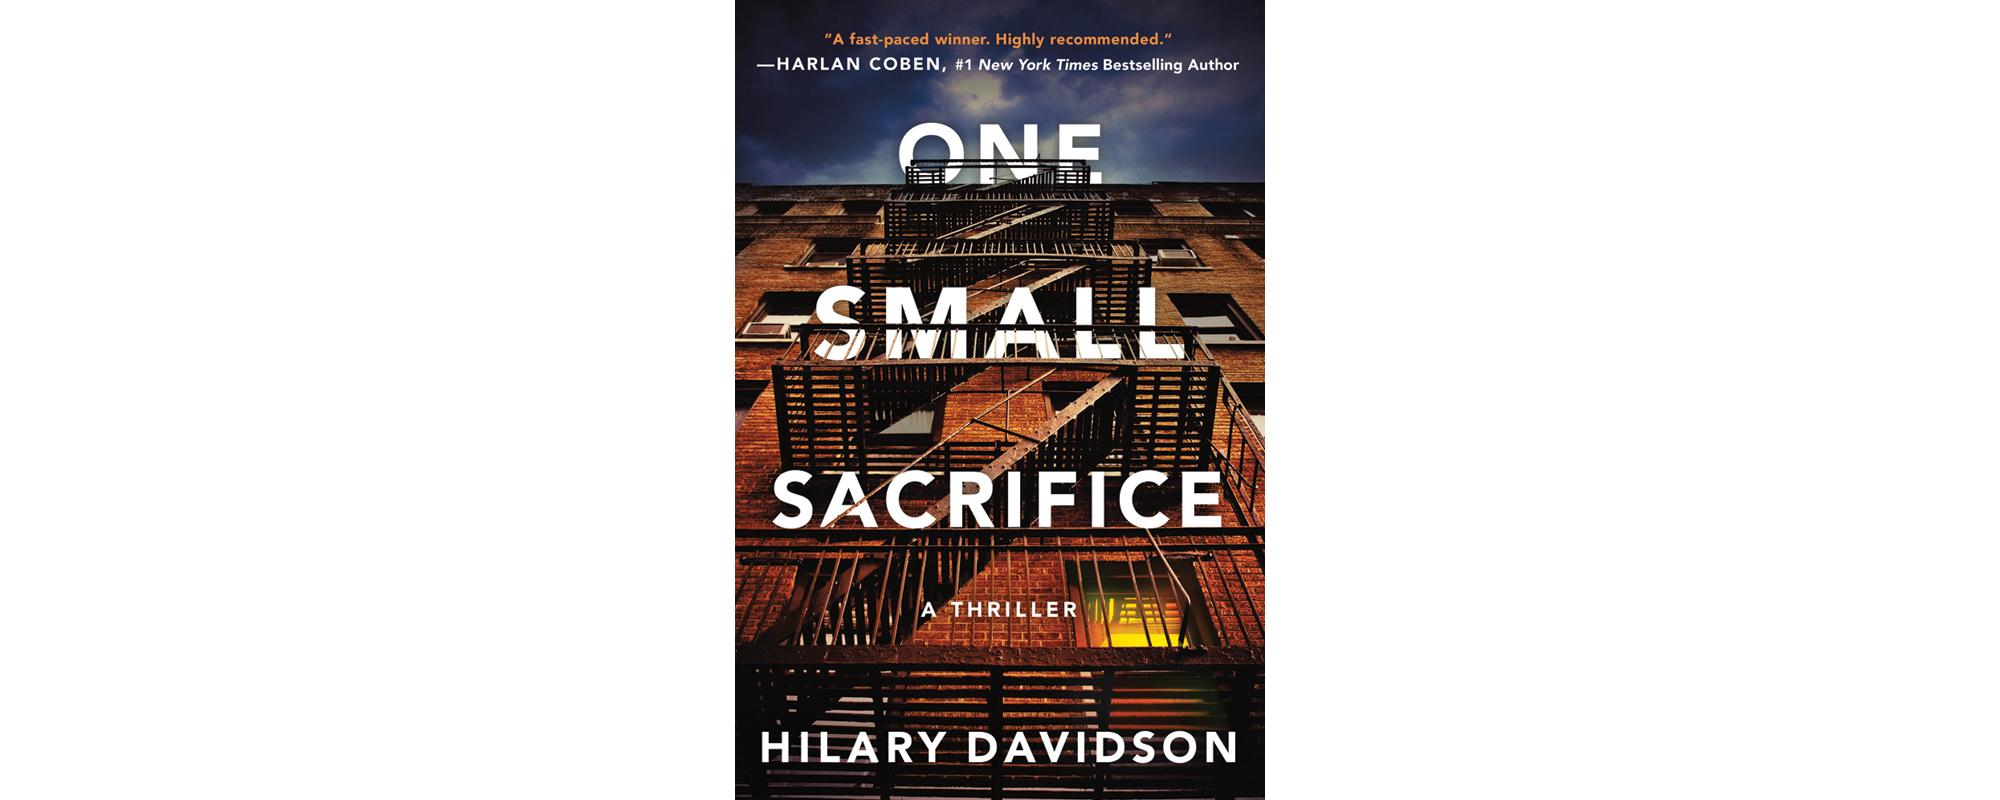 One Small Sacrifice Hilary Davidson